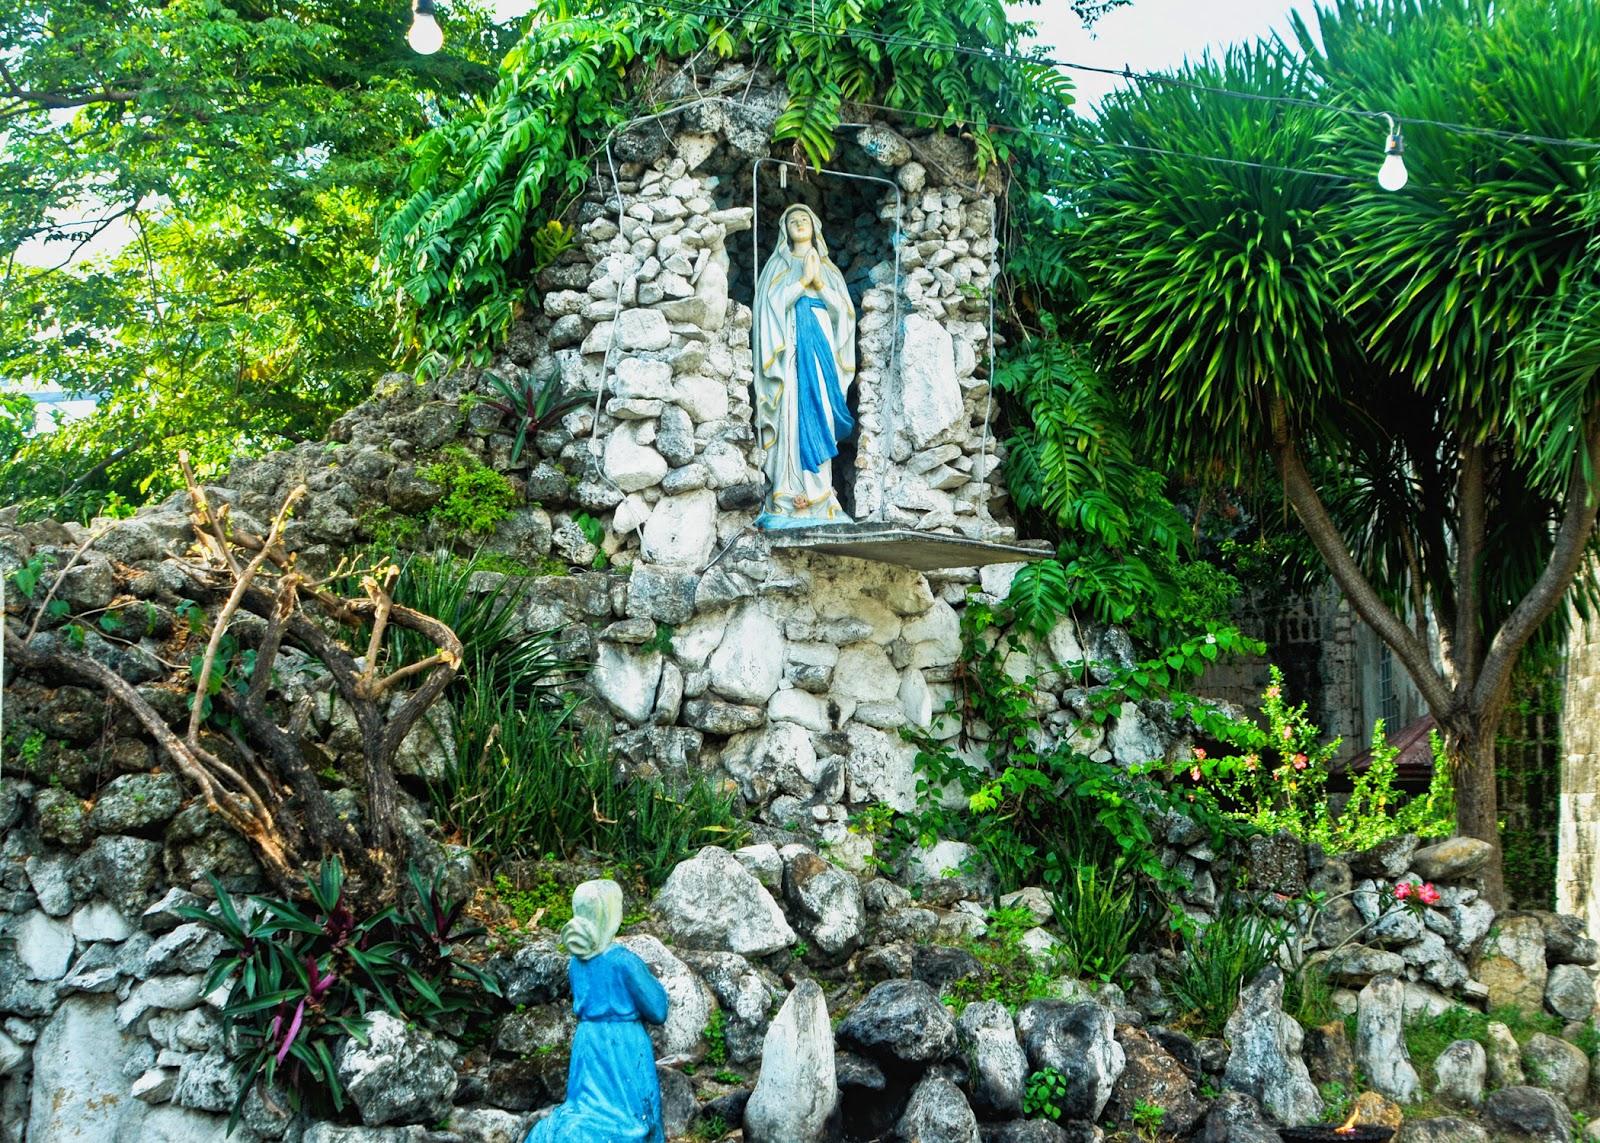 Cebu Events Photos And Images St Francis Of Assisi Chuch Naga Cebu